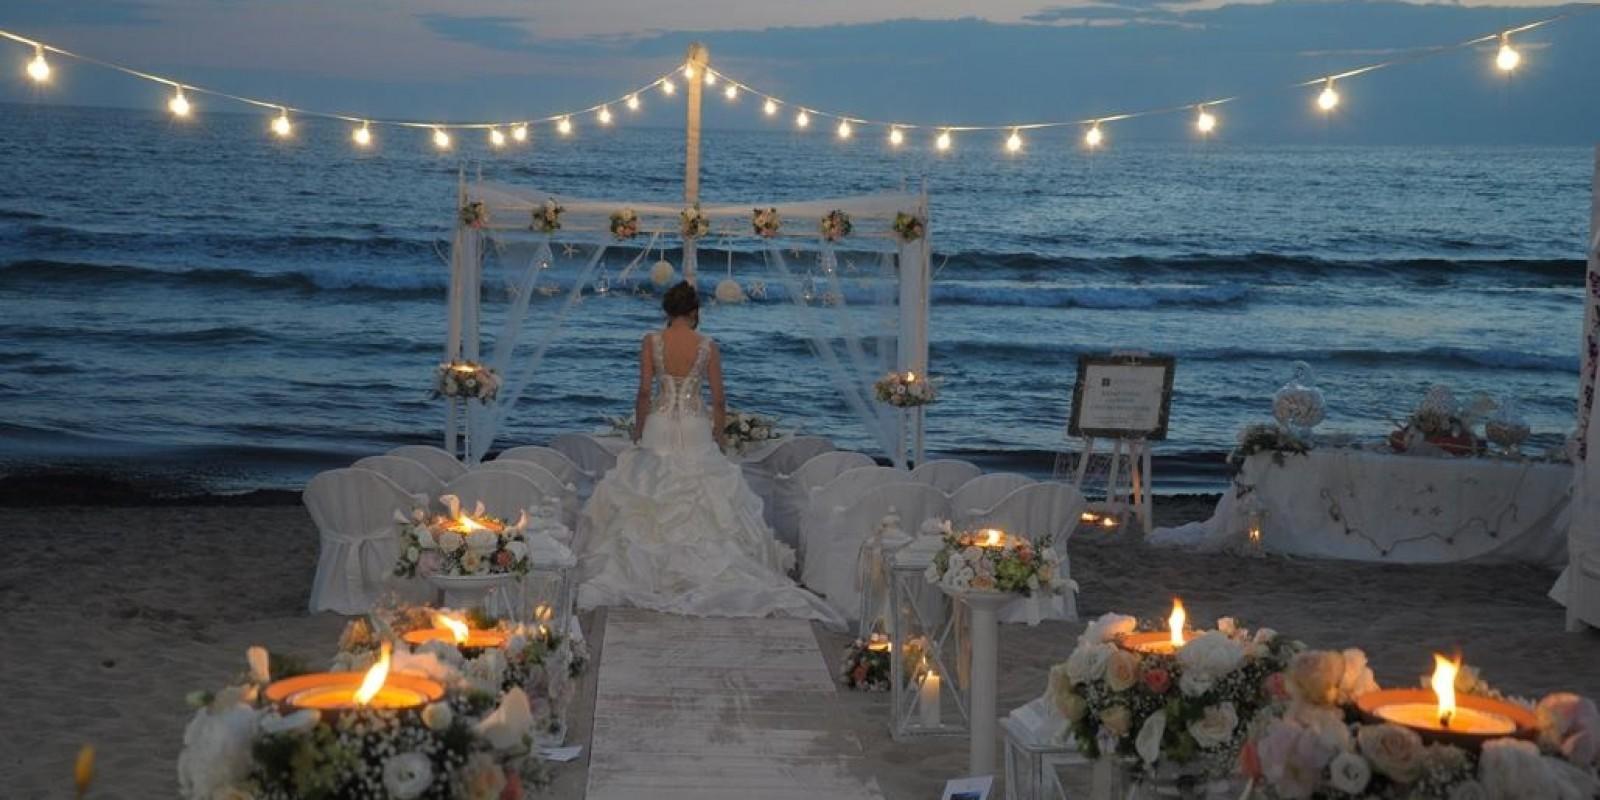 Matrimoni Vip Spiaggia : Matrimoni in spiaggia wl pineglen